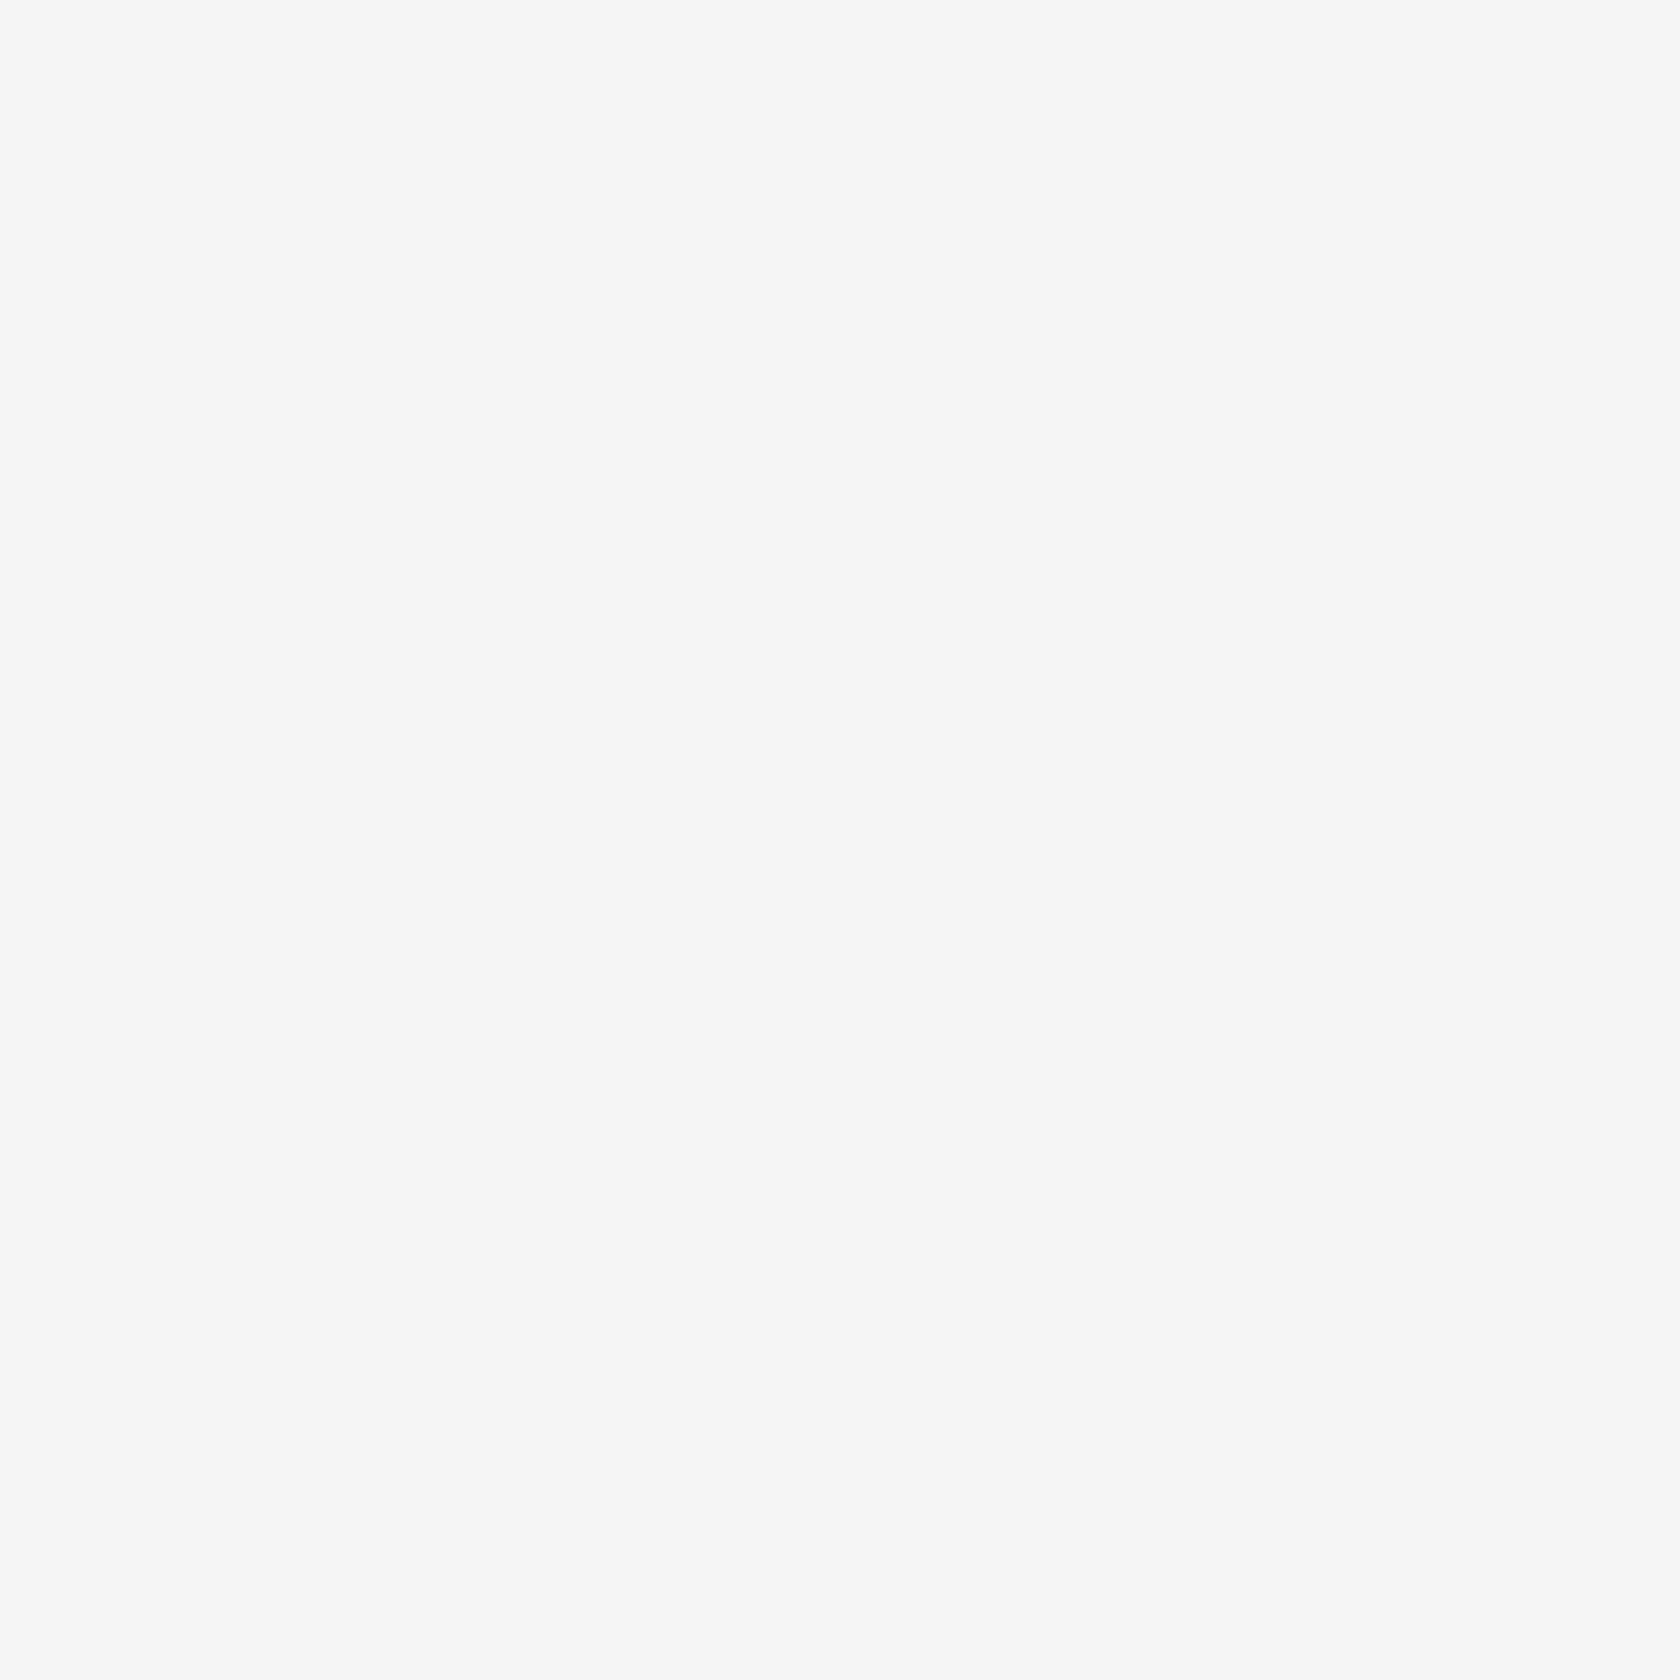 savon 24 faubourg hermes